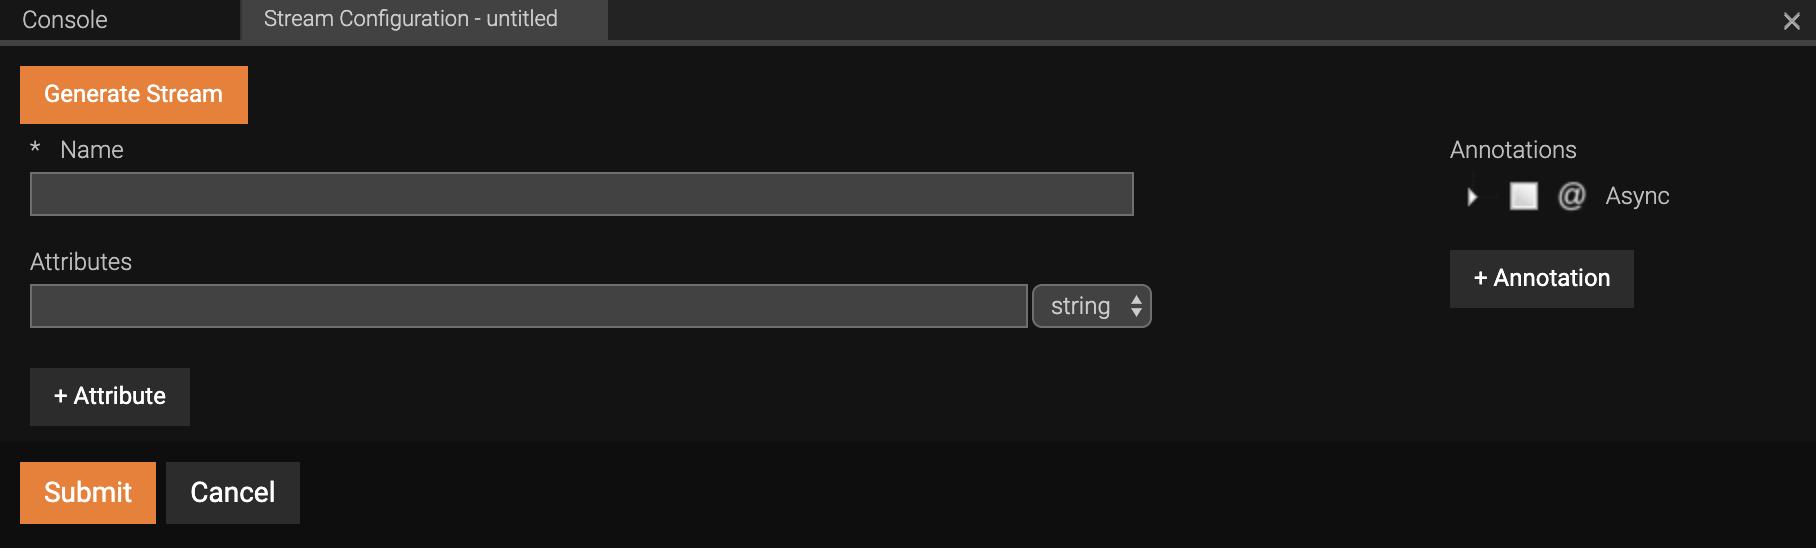 Stream Configuration form